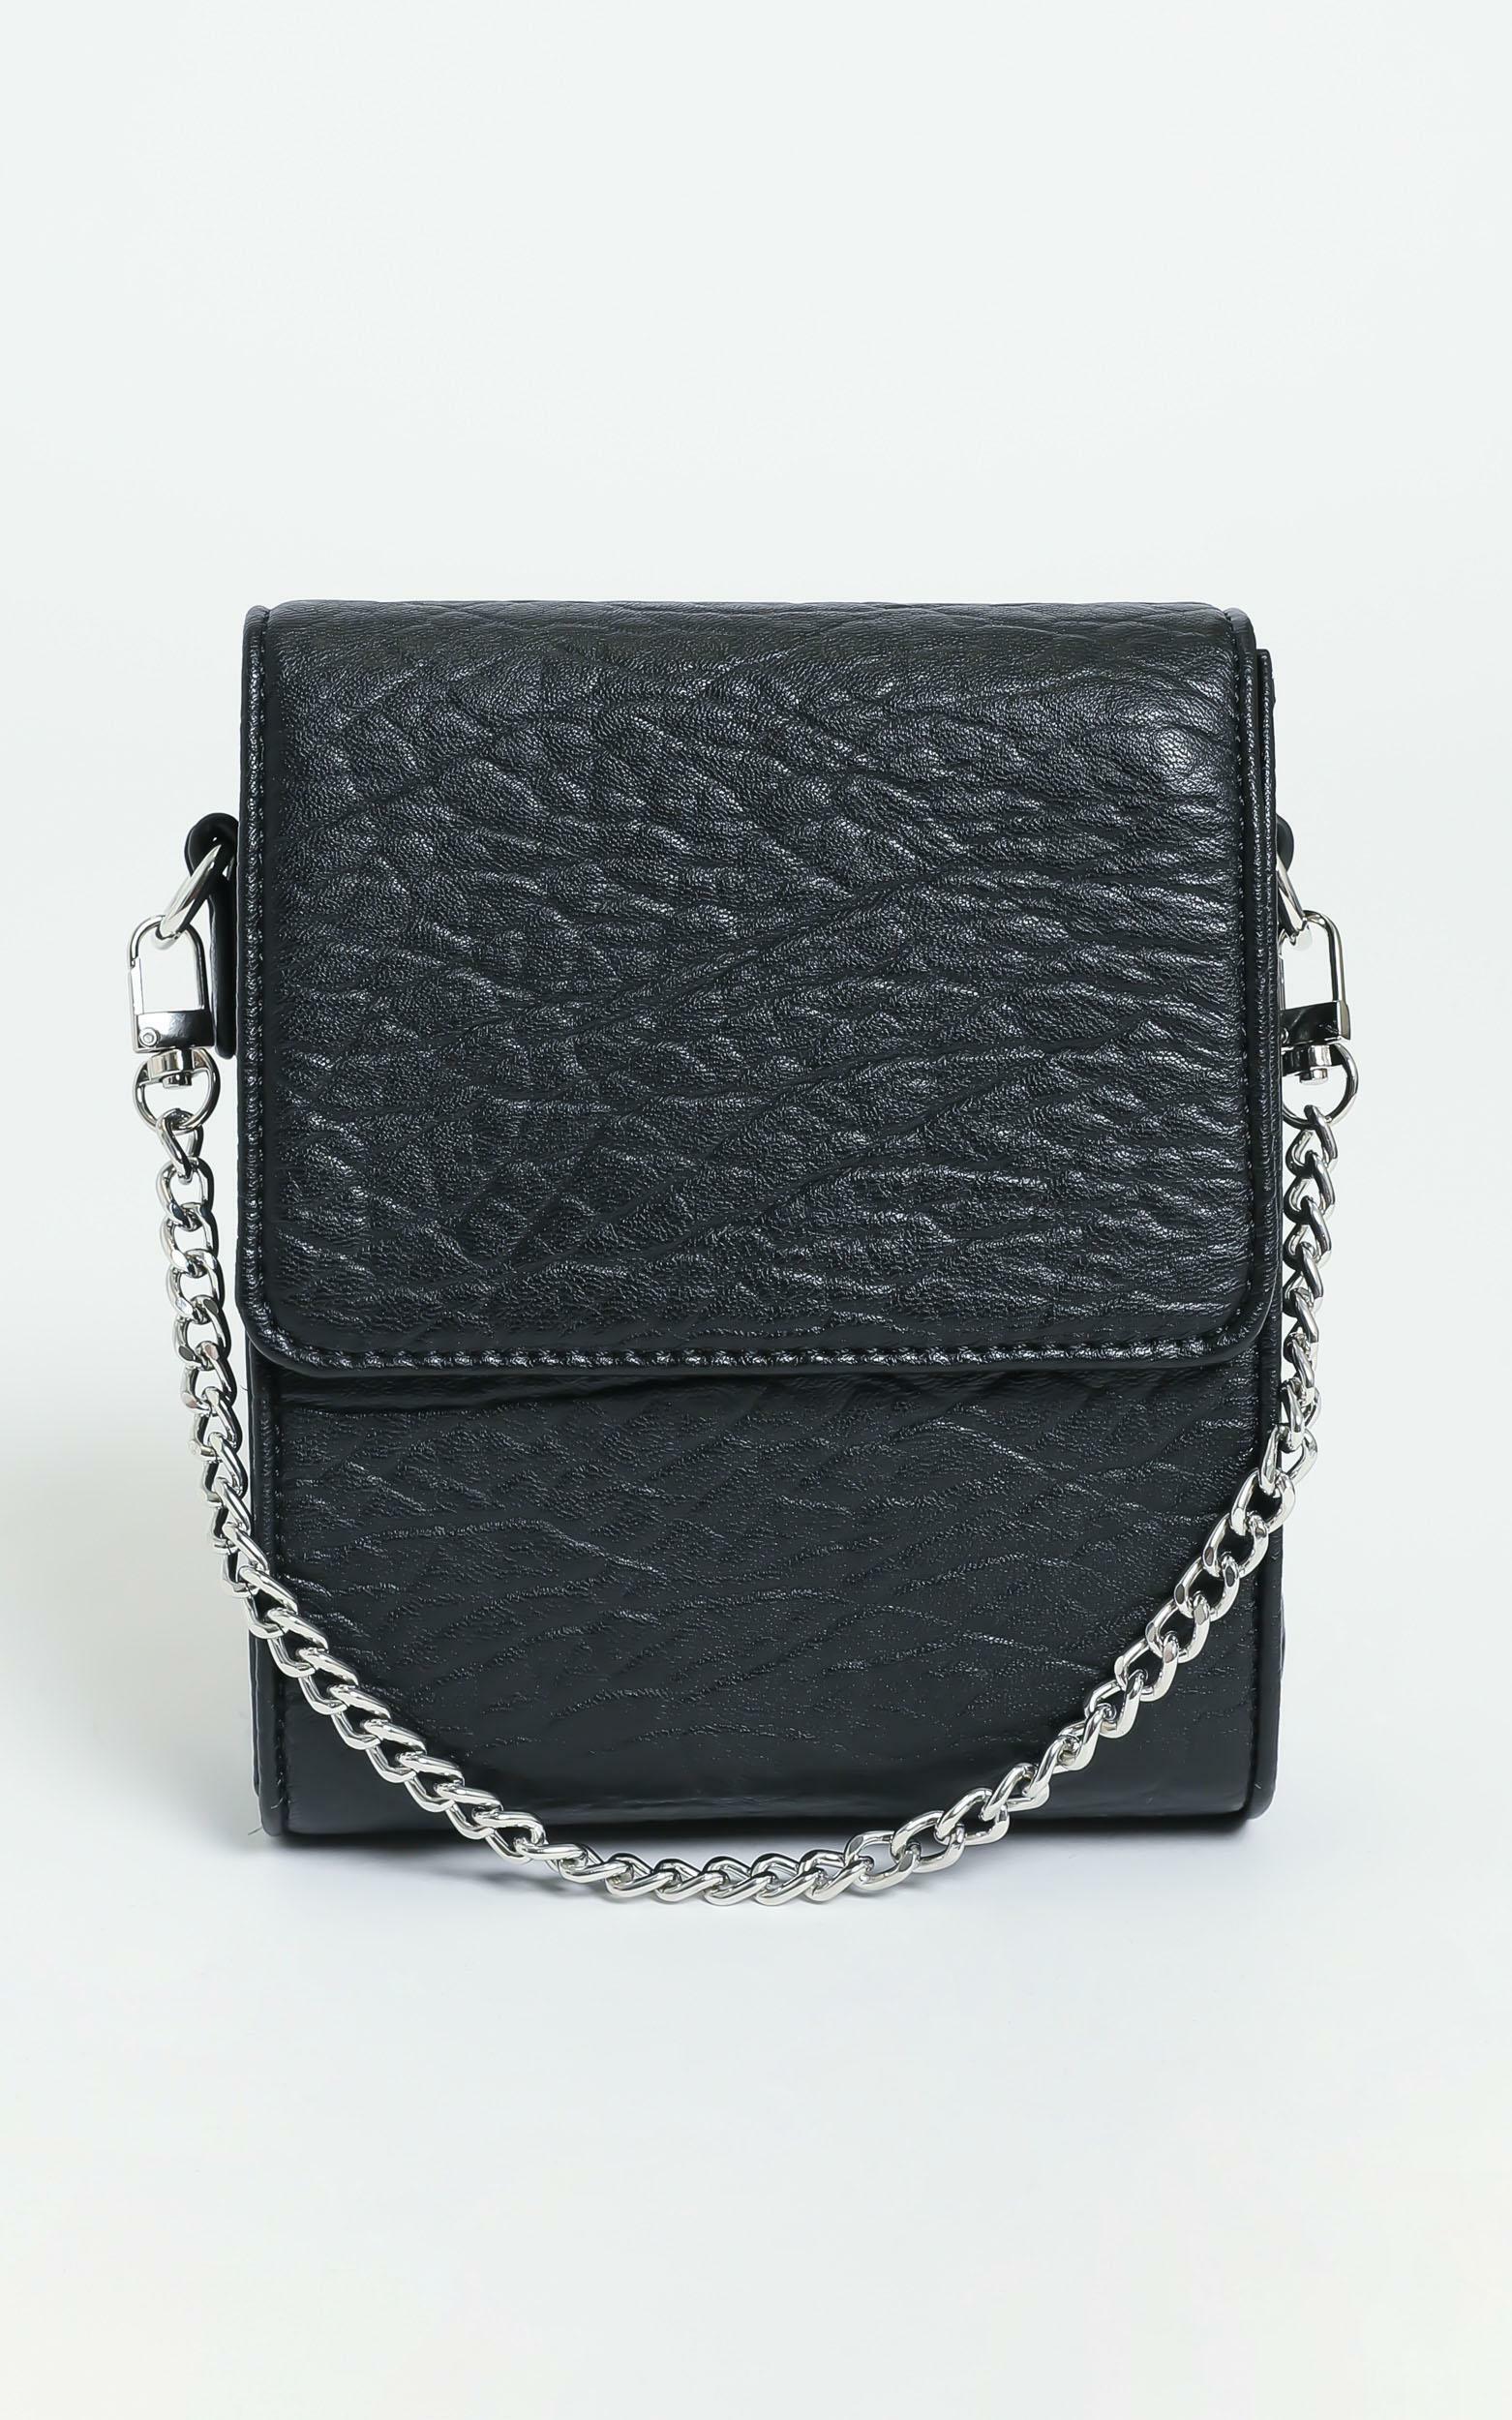 Georgia Mae - The Remi Bag in Black, , hi-res image number null